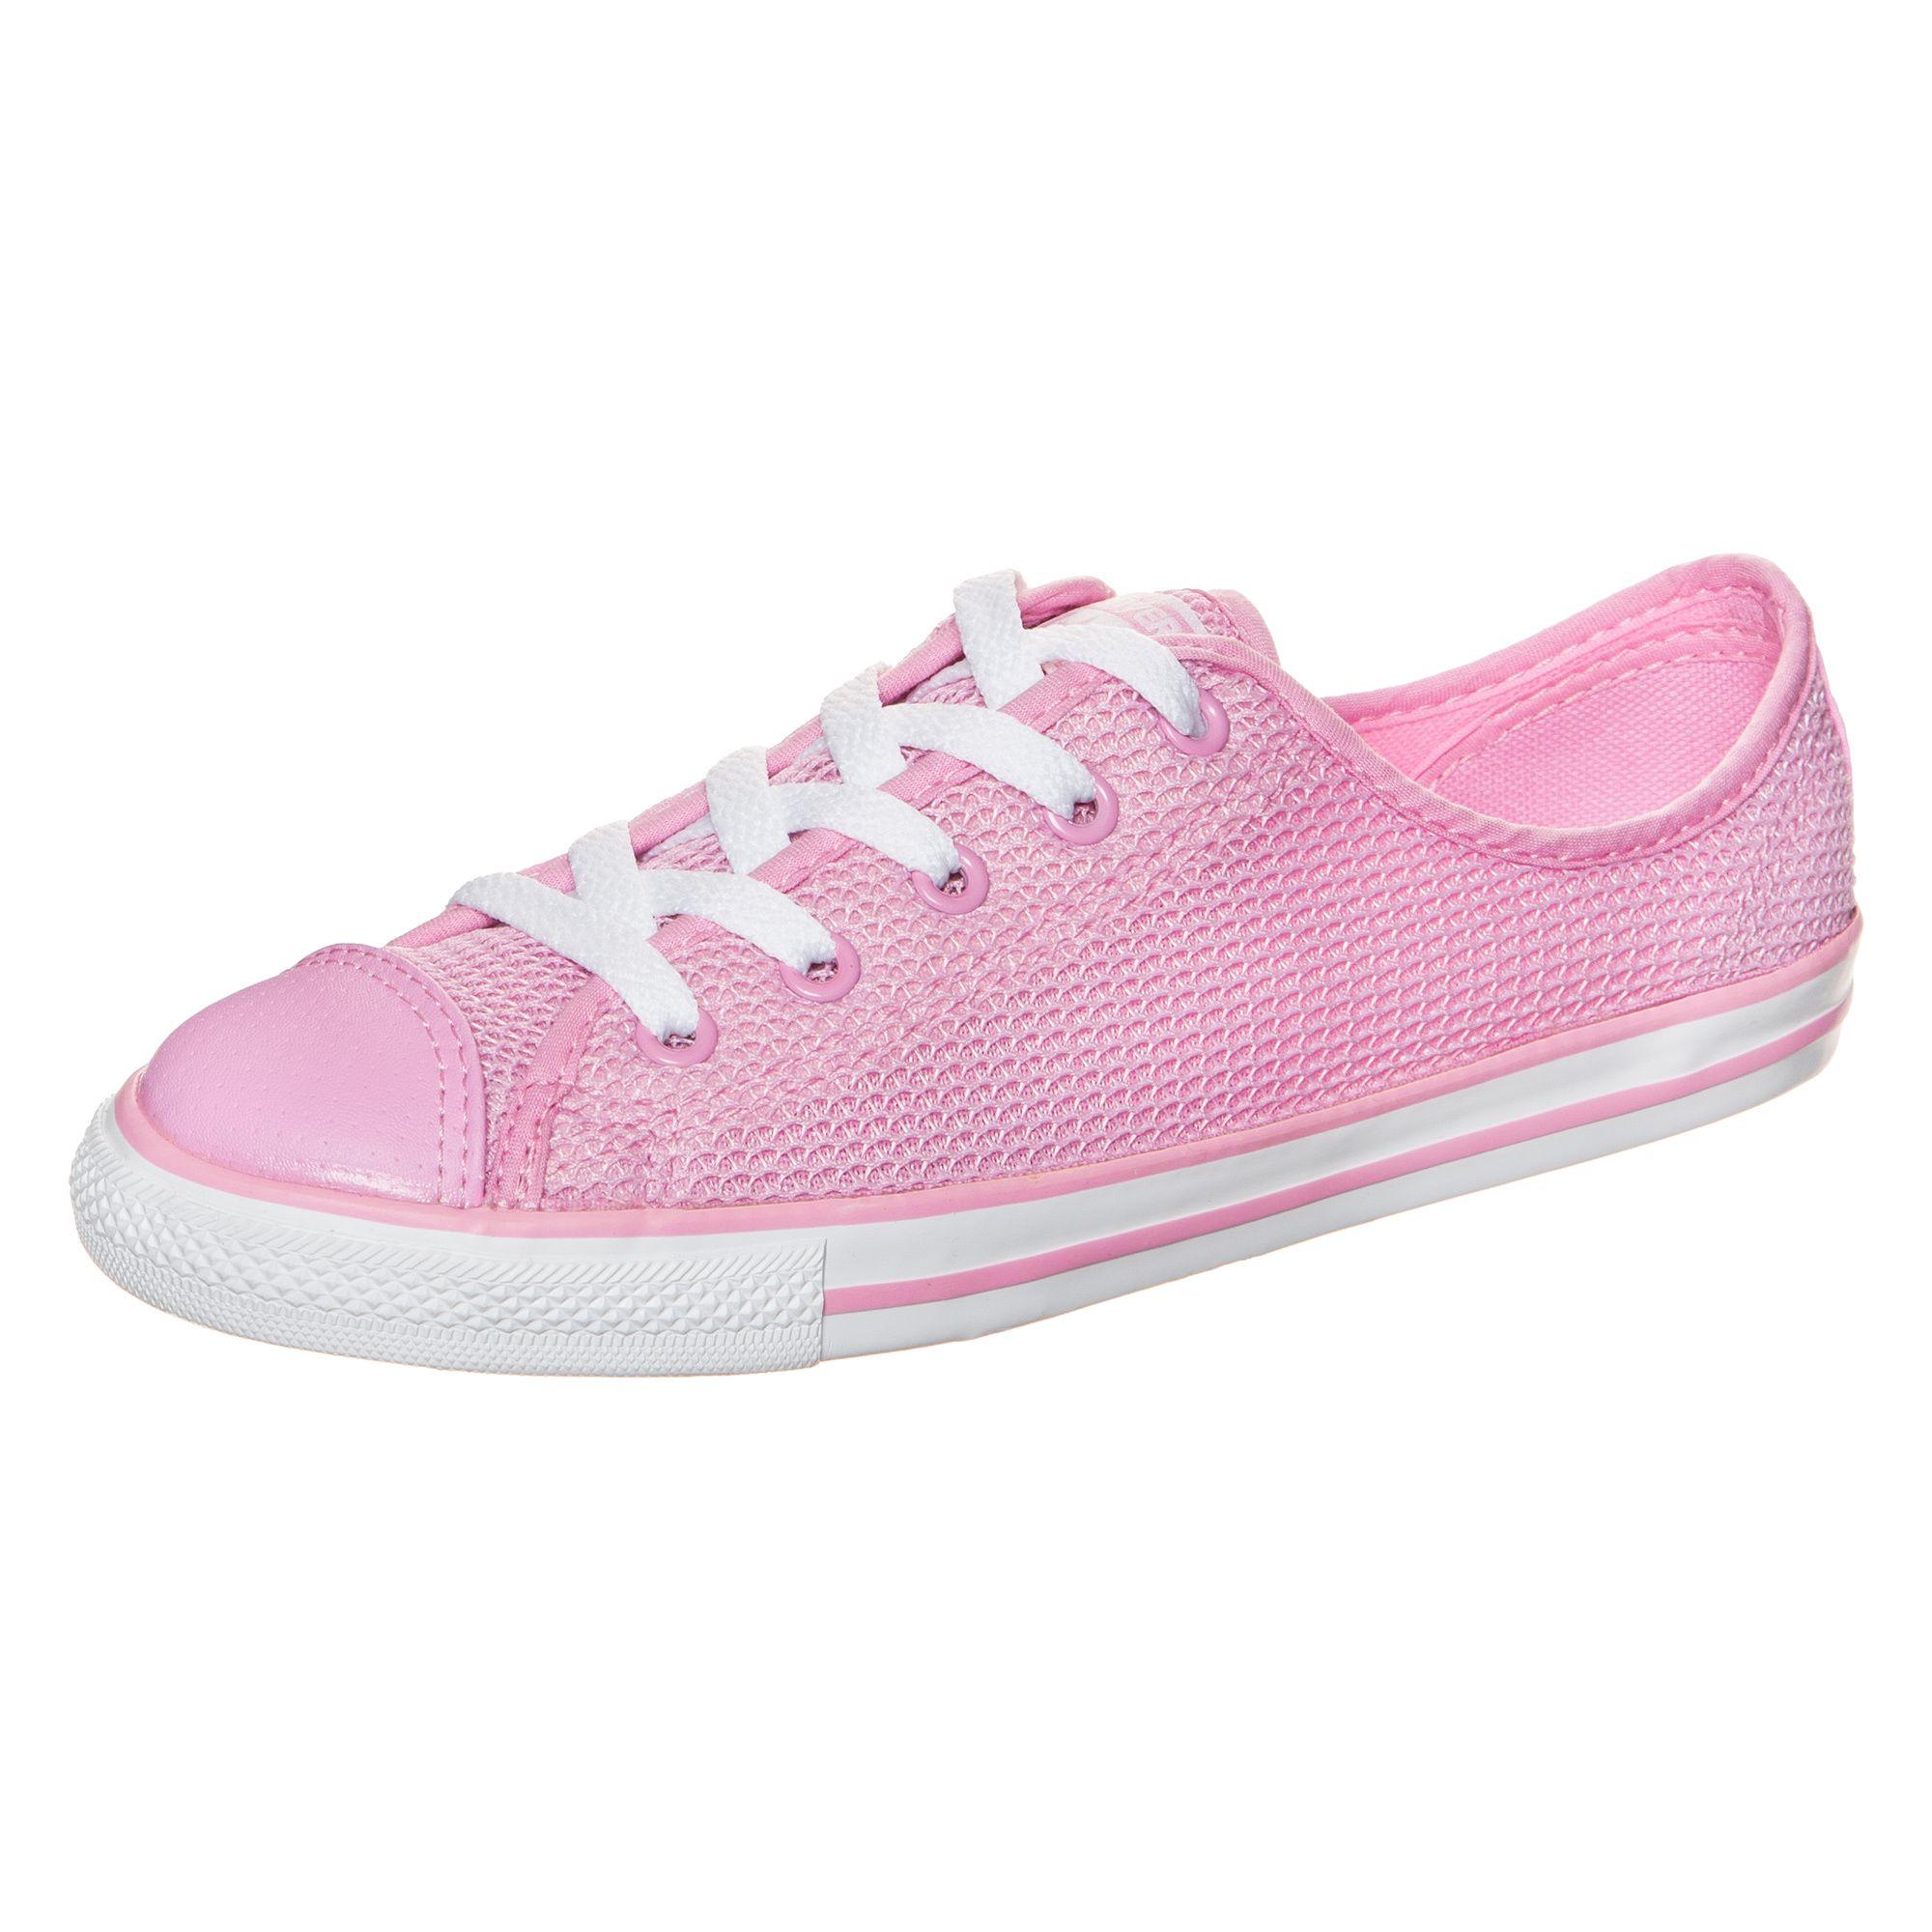 CONVERSE Converse Chuck Taylor All Star Dainty OX Sneaker Damen